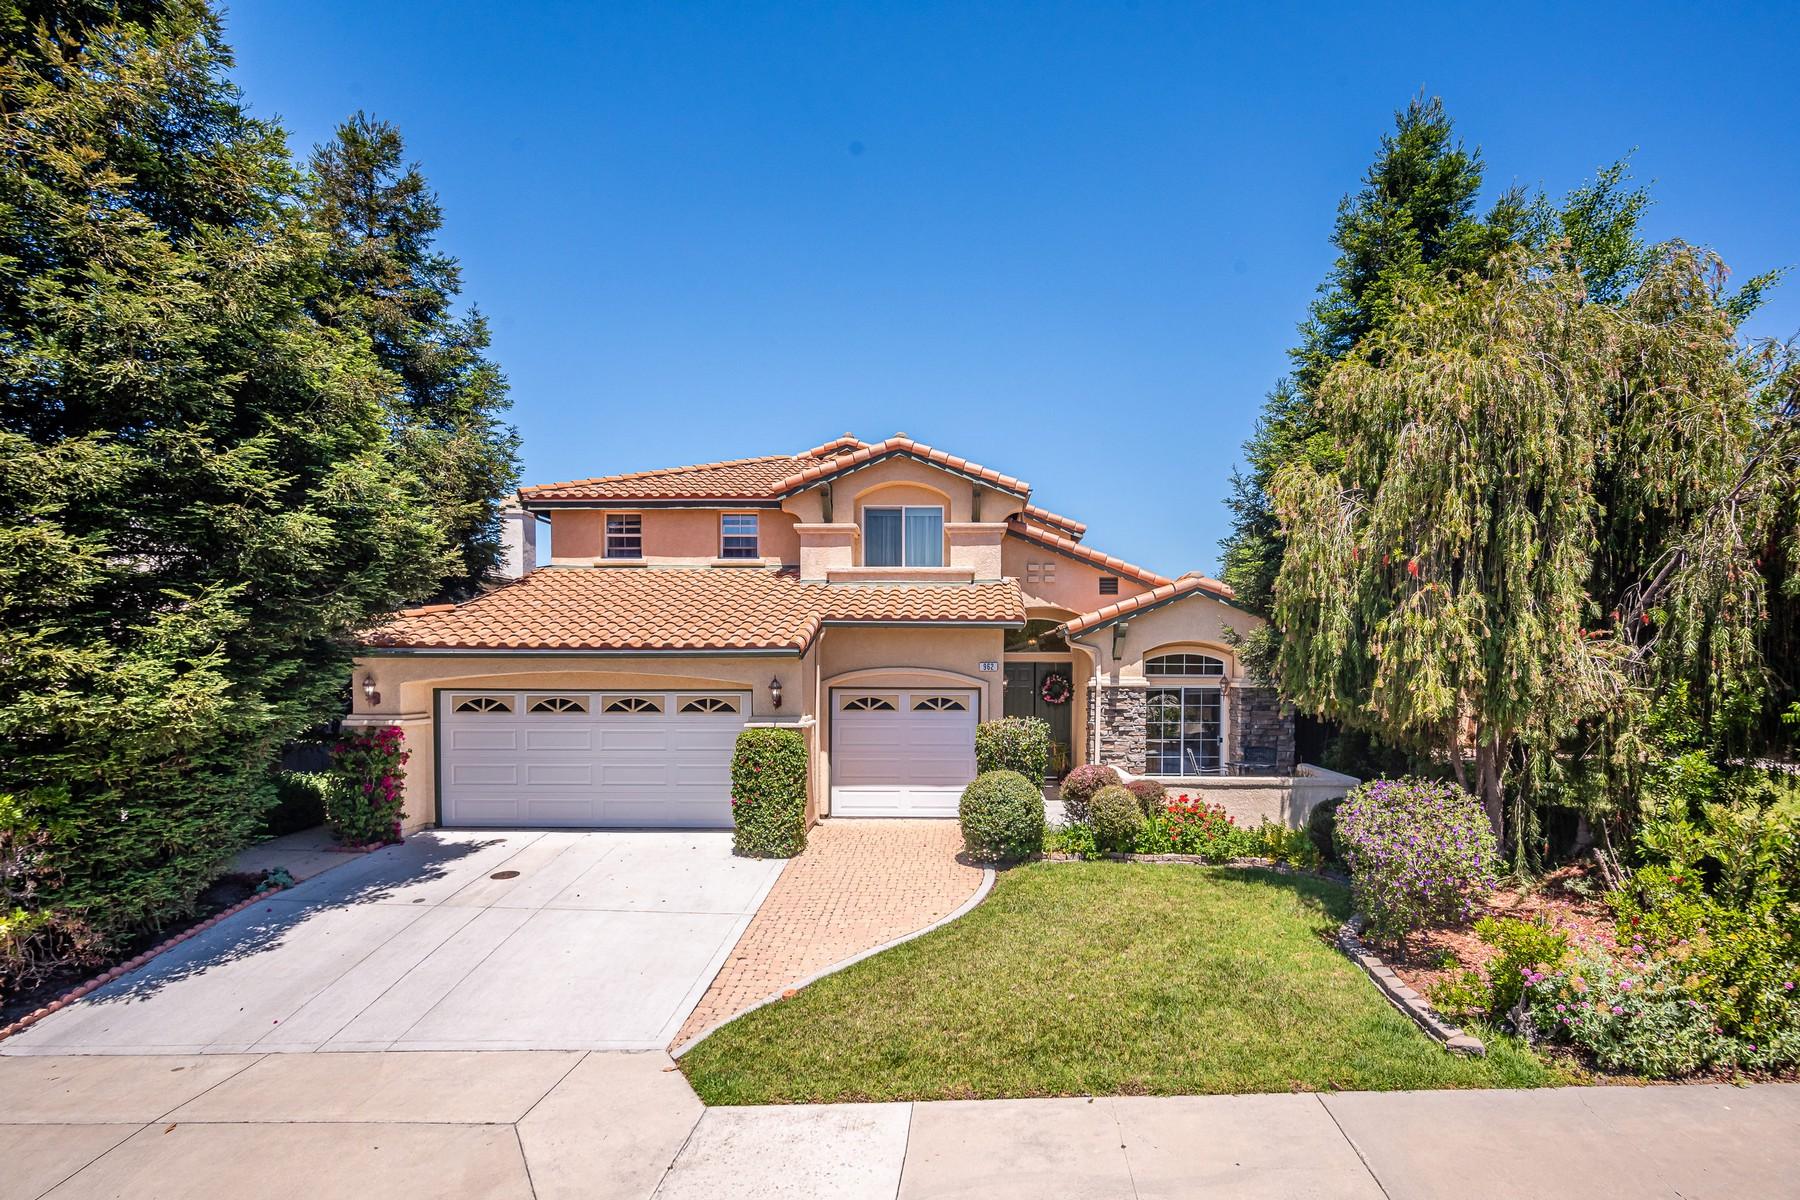 Single Family Homes for Sale at Spacious SLO Home 962 Goldenrod Lane San Luis Obispo, California 93401 United States